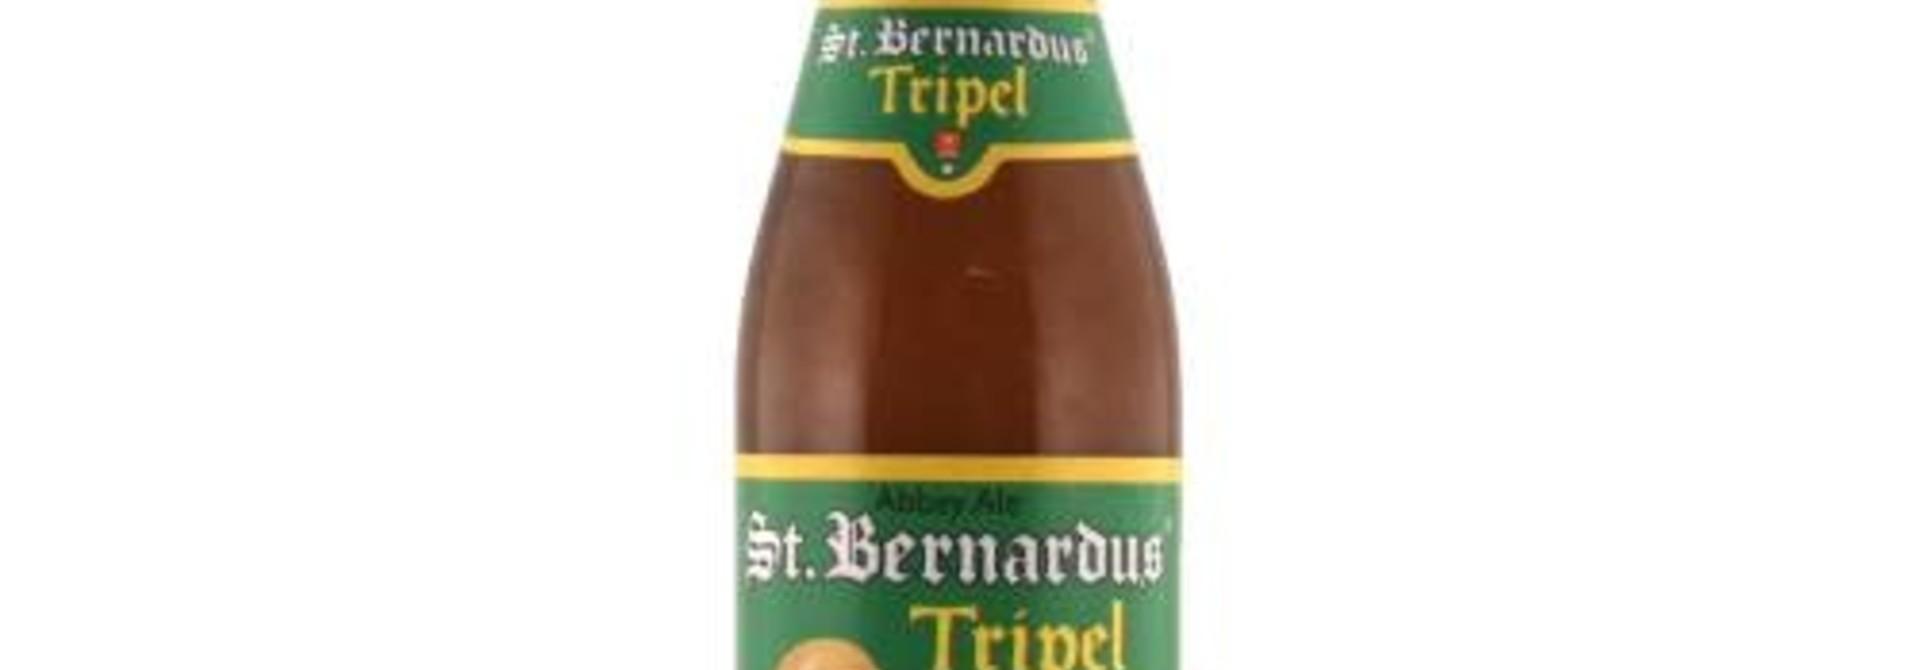 ST. BERNARDUS TRIPEL 33CL